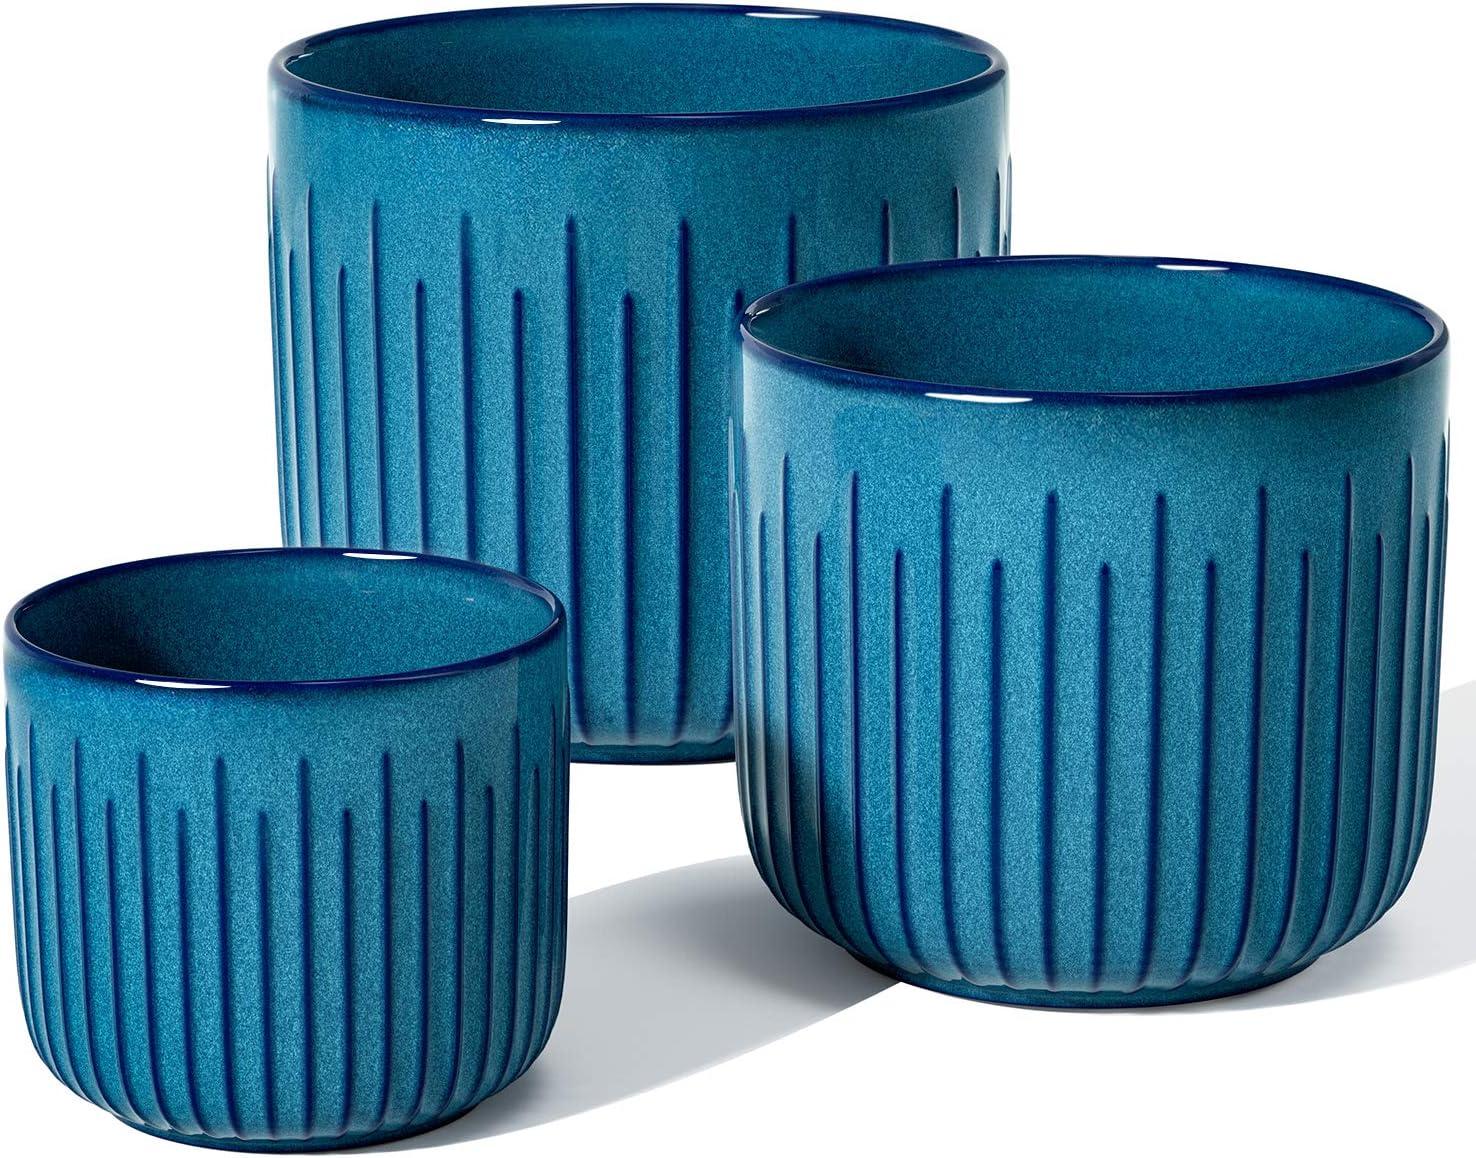 LE TAUCI Plant Pots, Large Planter Ceramic, 8.3+6.9+5.7 inch Flower Pot for Plants with Drainage Holes, Garden Planters Outdoor, Indoor House Plants, Set of 3, Reactive Glaze Blue